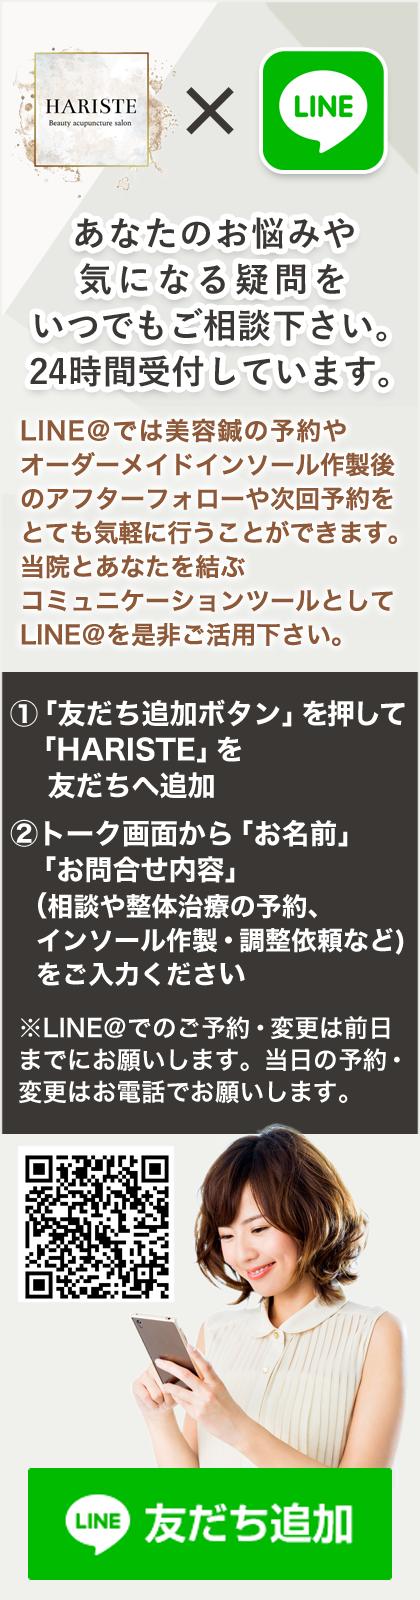 LINE@で整体治療の予約・ご相談受付中